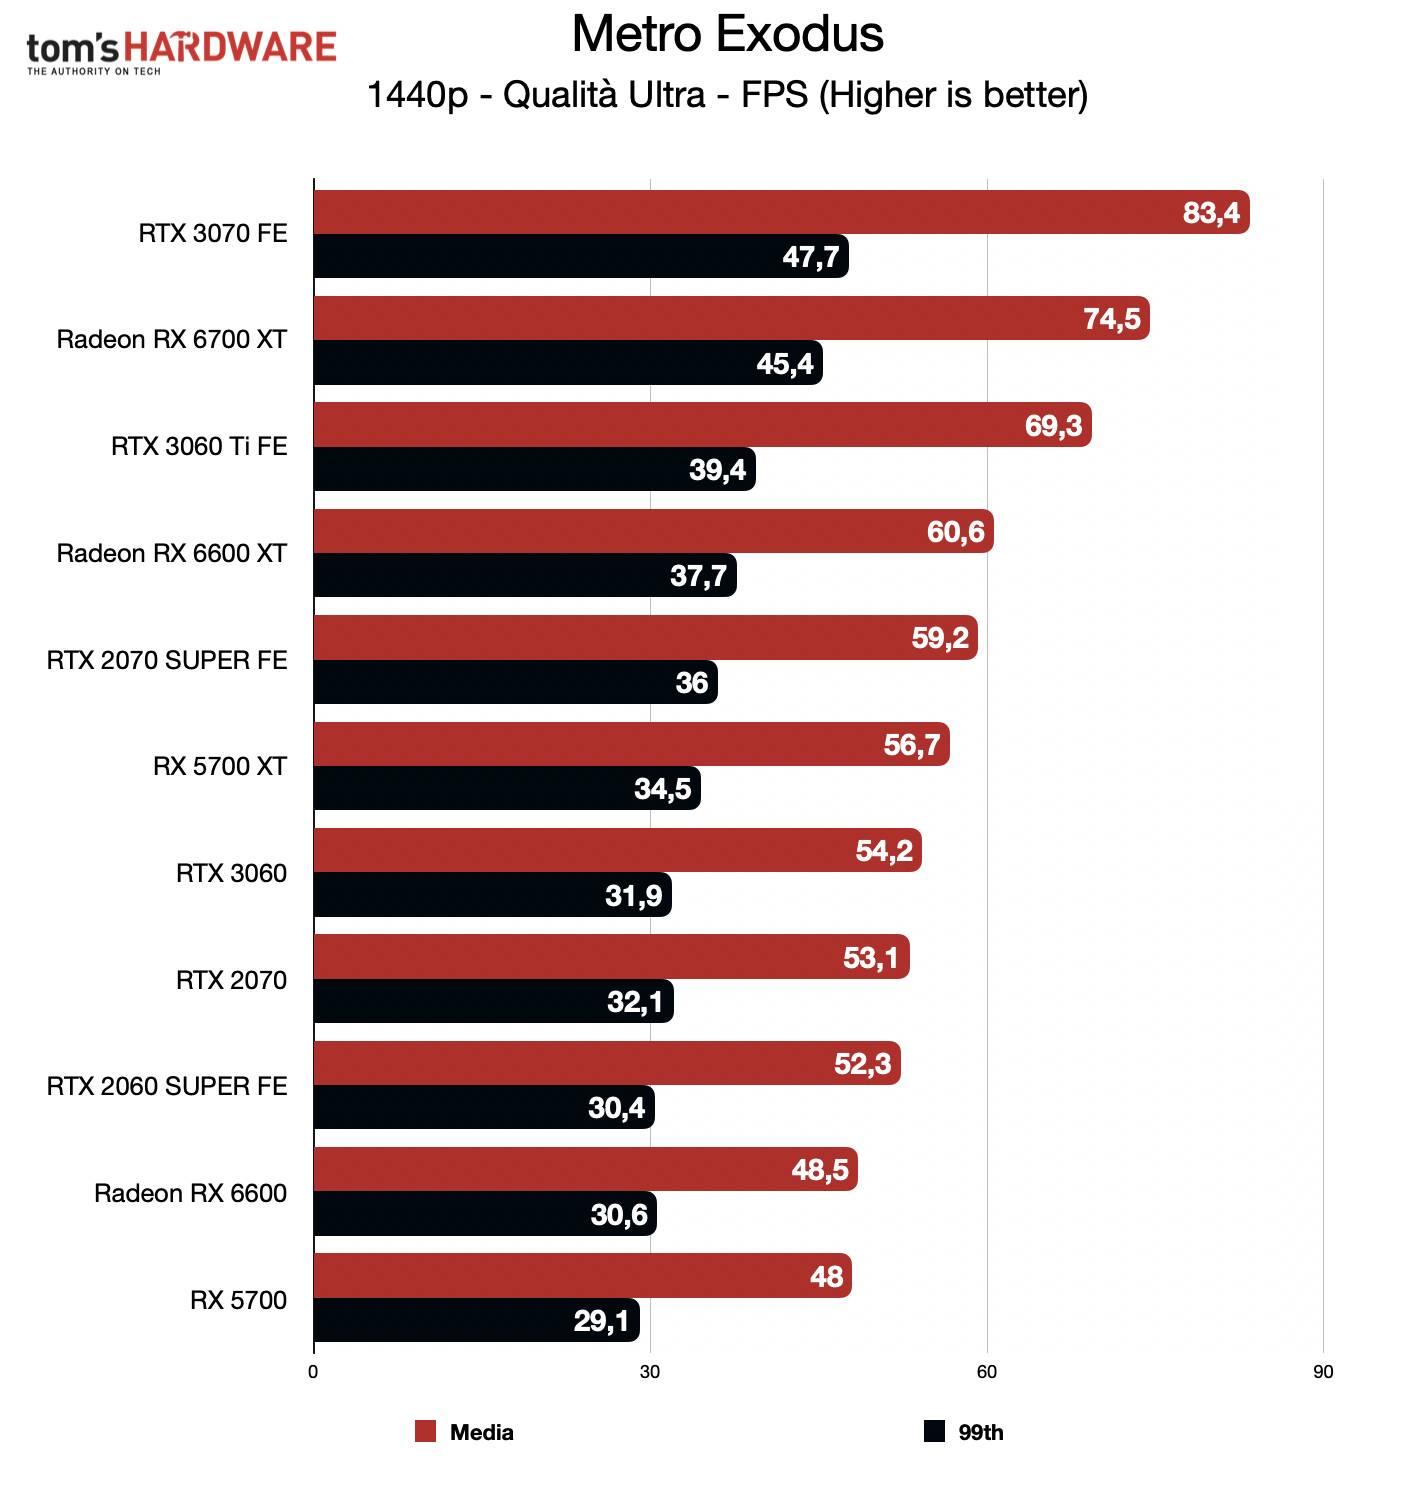 Benchmark Radeon RX 6600 - QHD - Metro Exodus